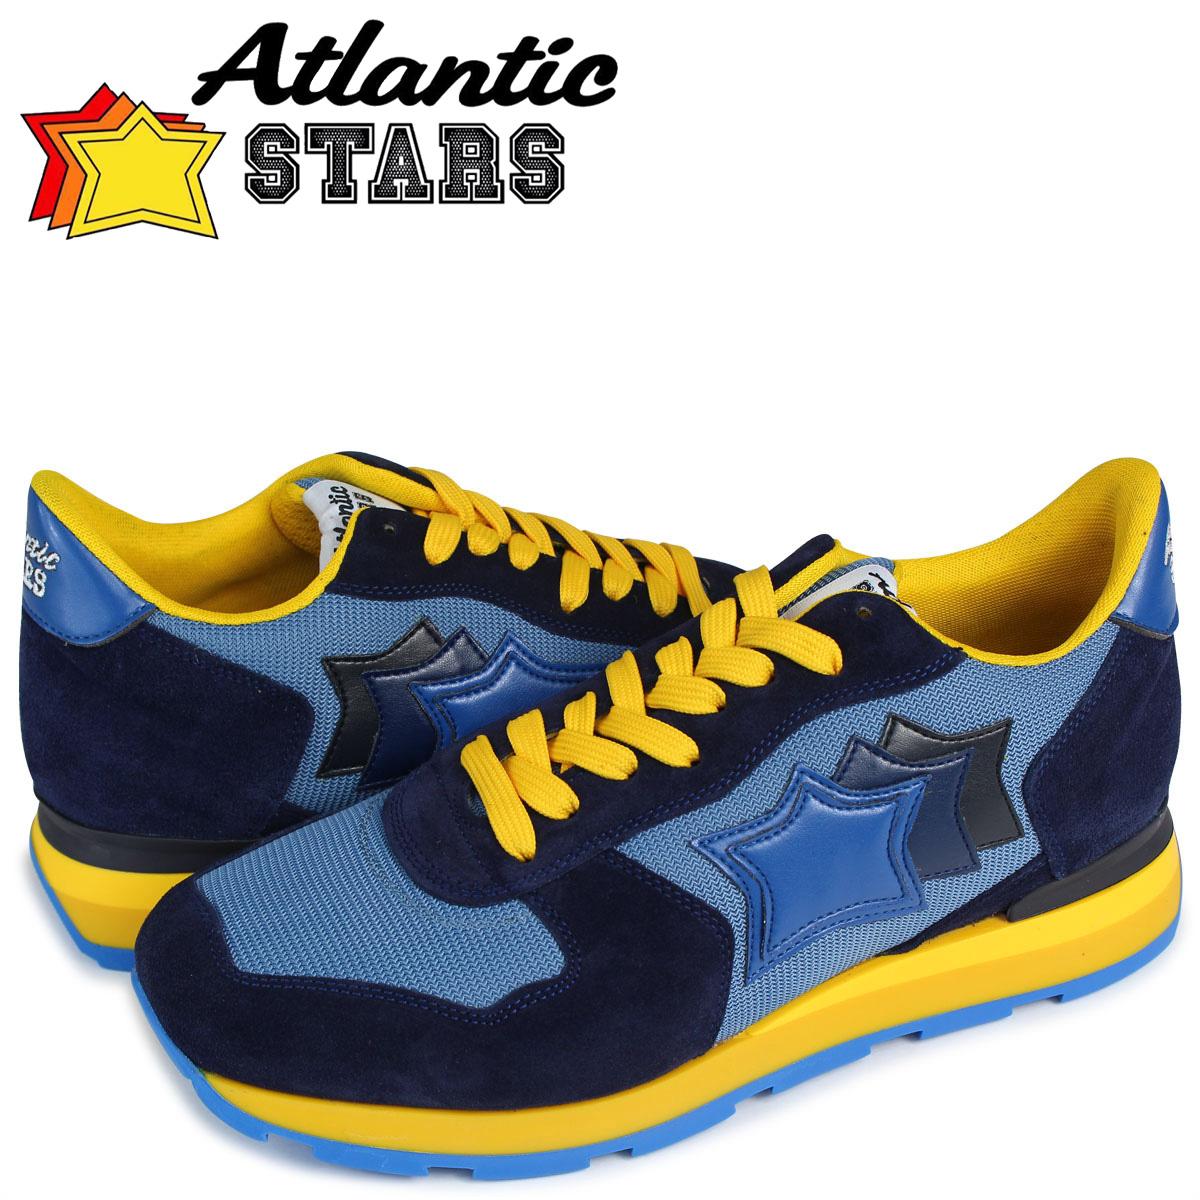 Atlantic STARS メンズ スニーカー アトランティックスターズ アンタレス ANTARES WAG-23NY 靴 ブルー